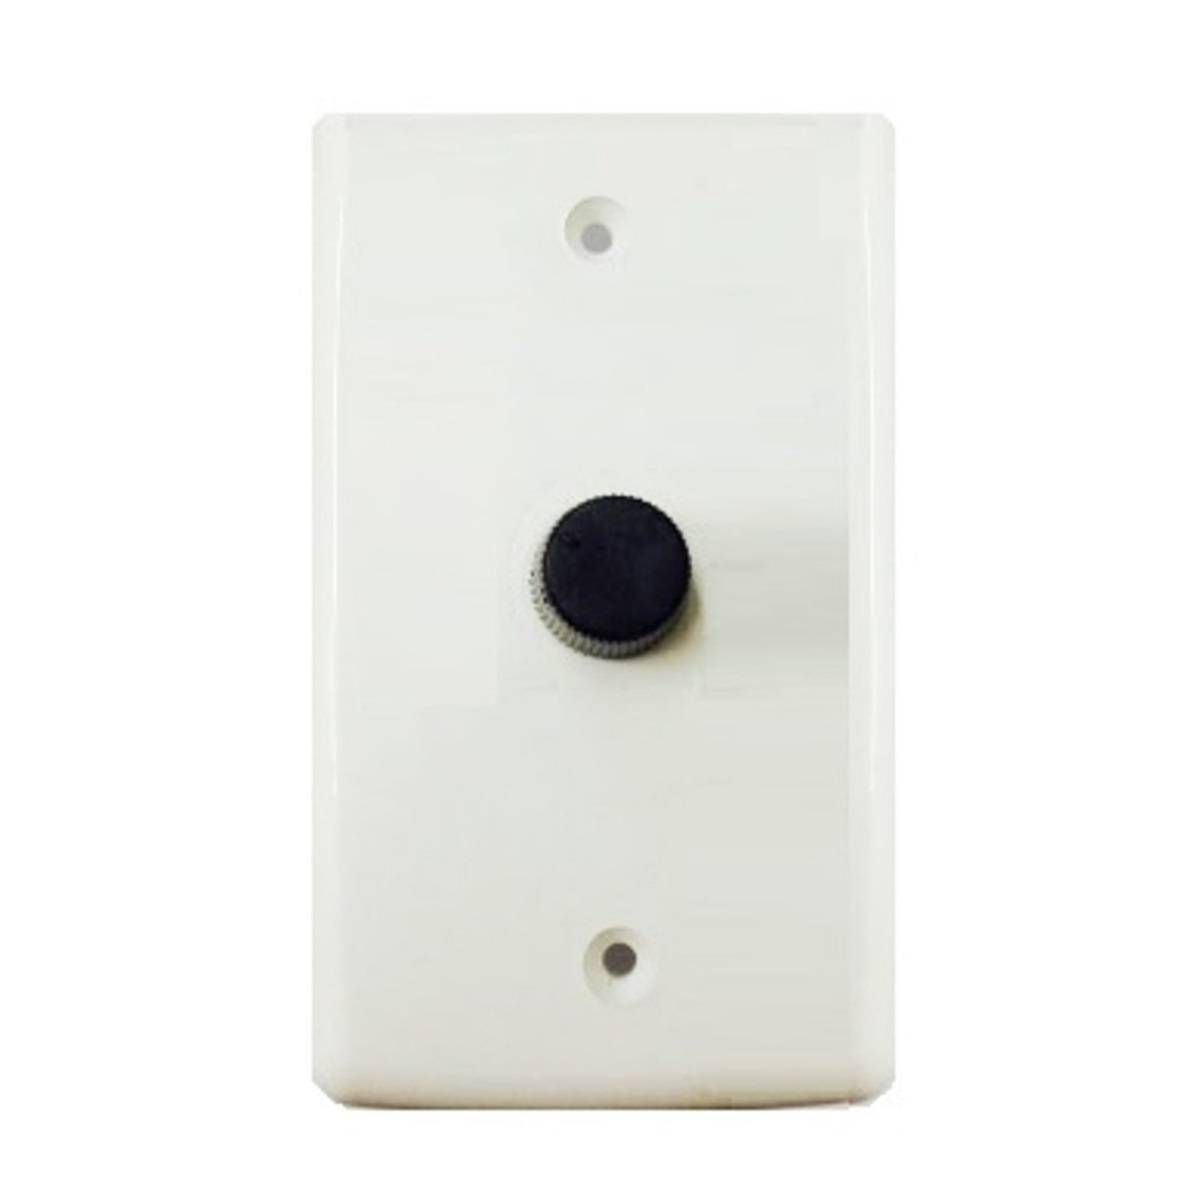 Kit 6 Ventiladores Parede Bivolt Branco Oscilante 60 Cm